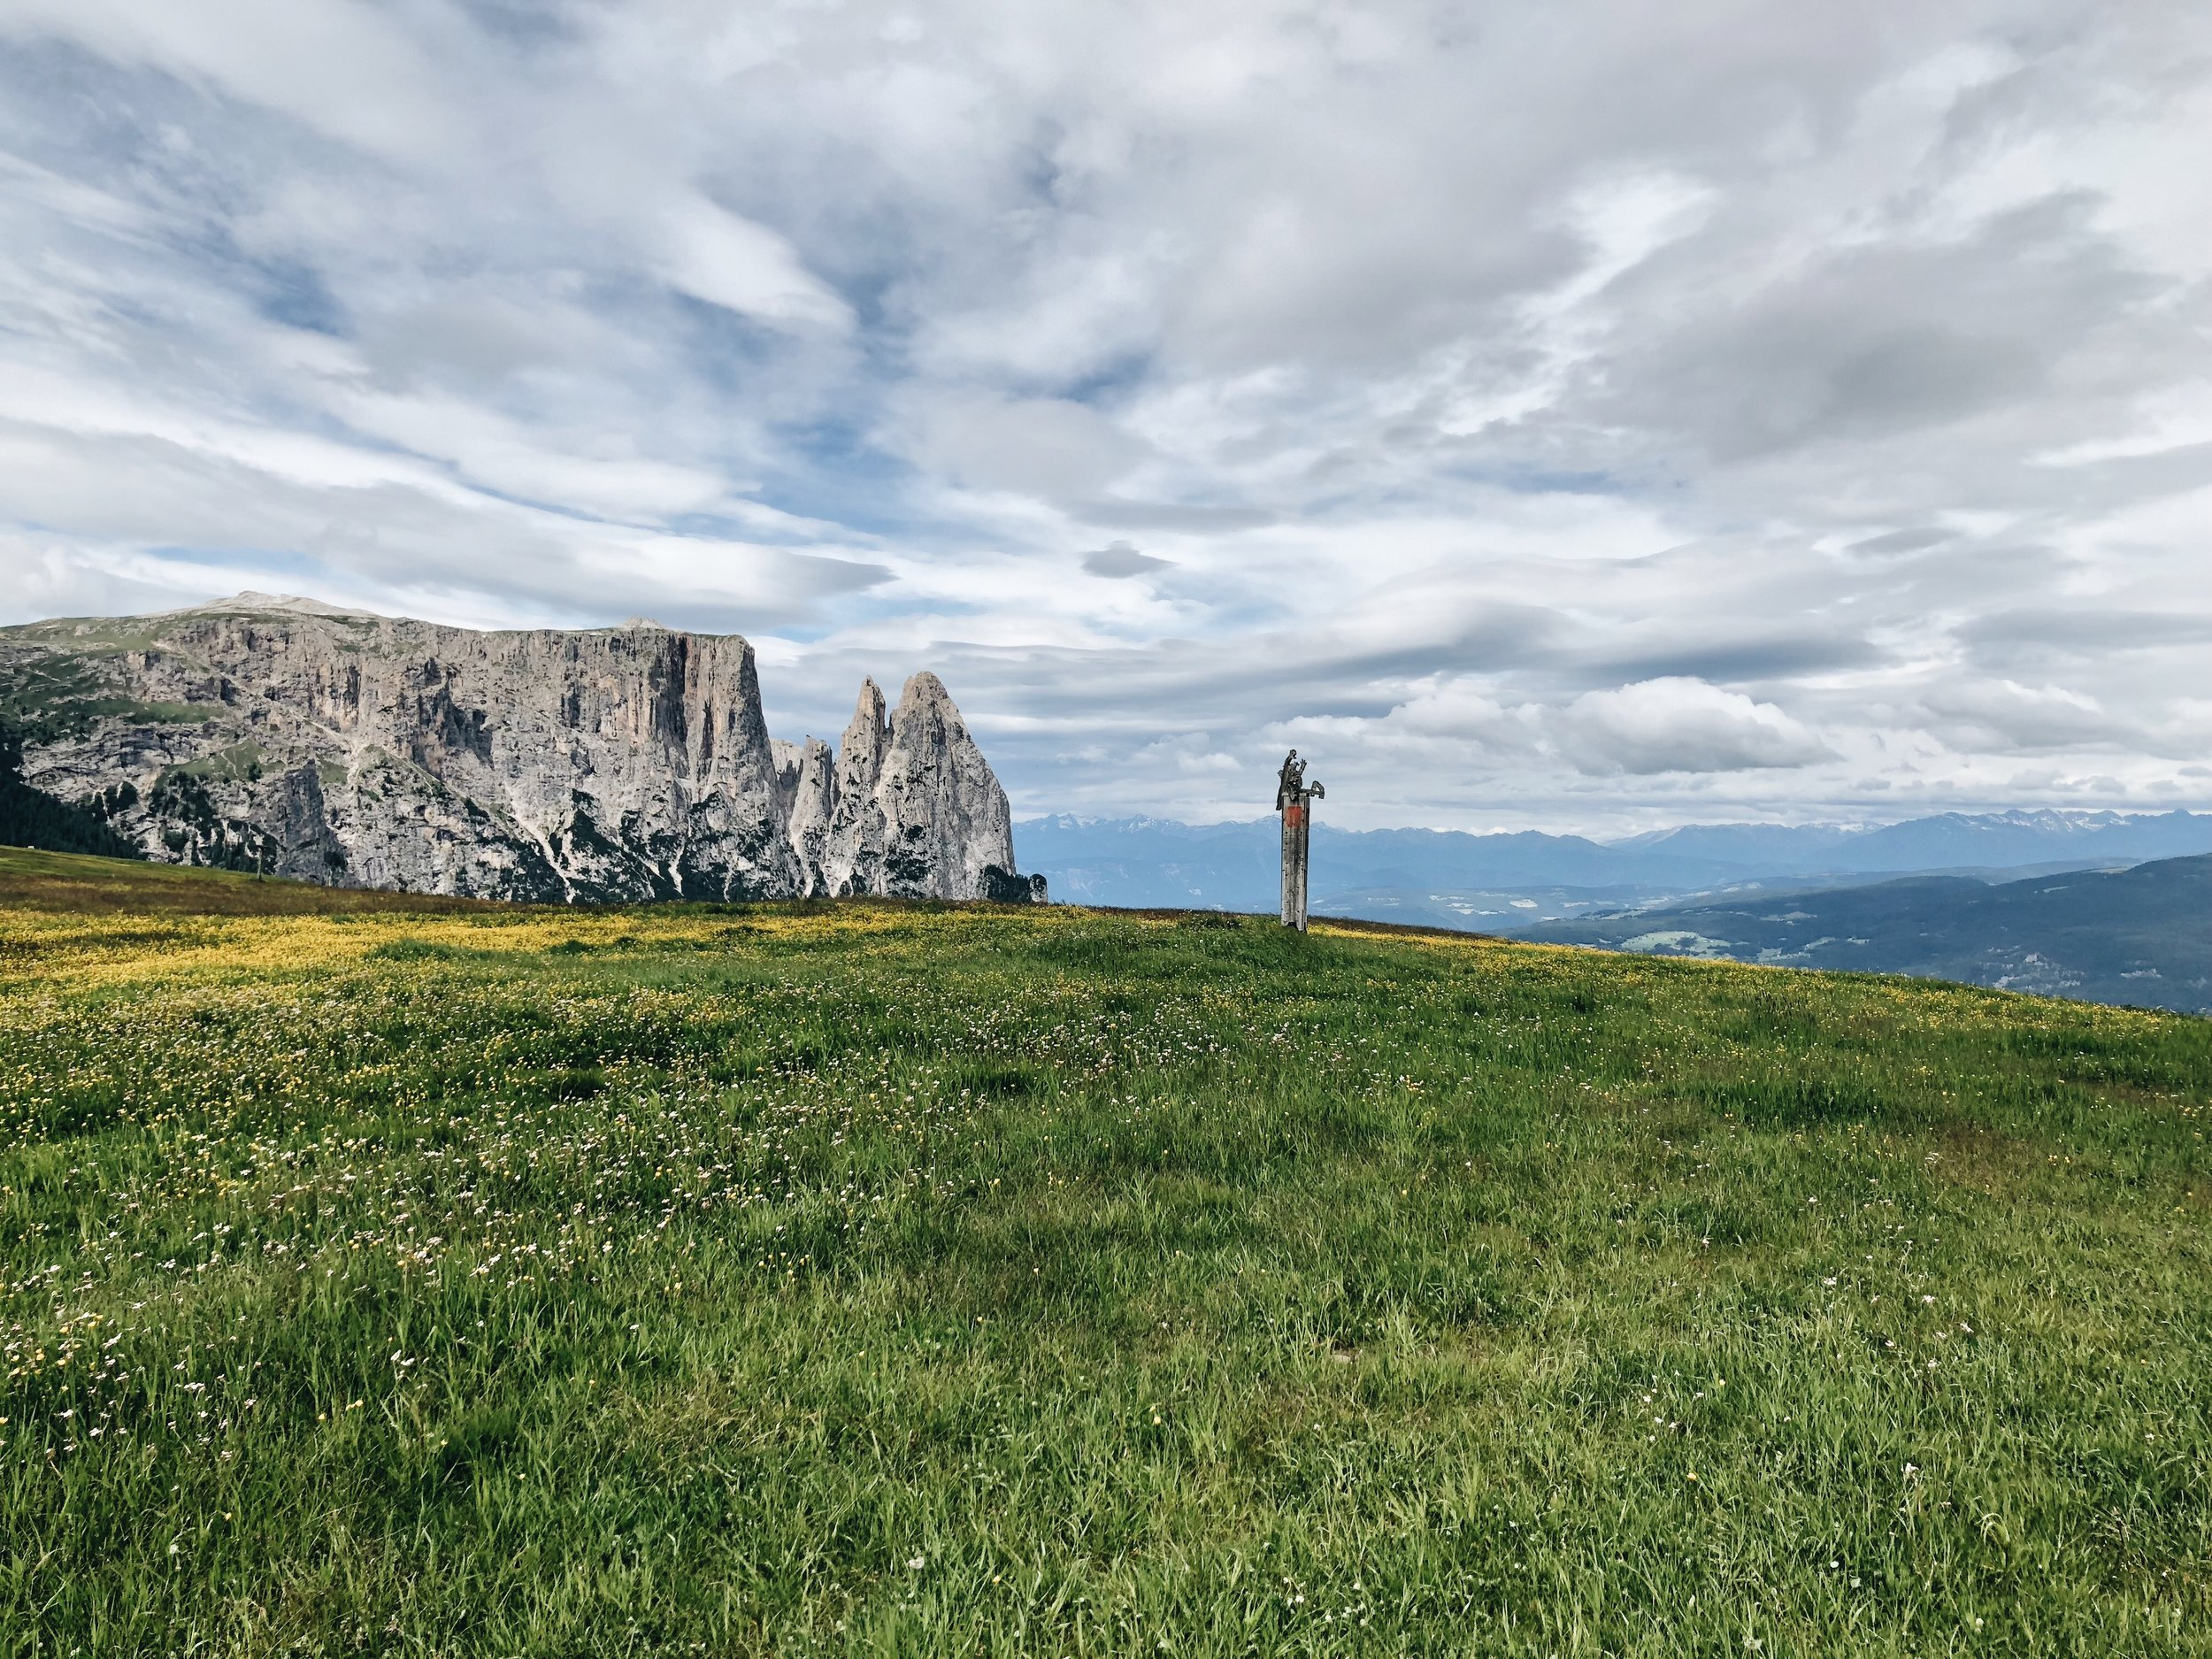 The Italian Alps. Seis, Italy. 2019.